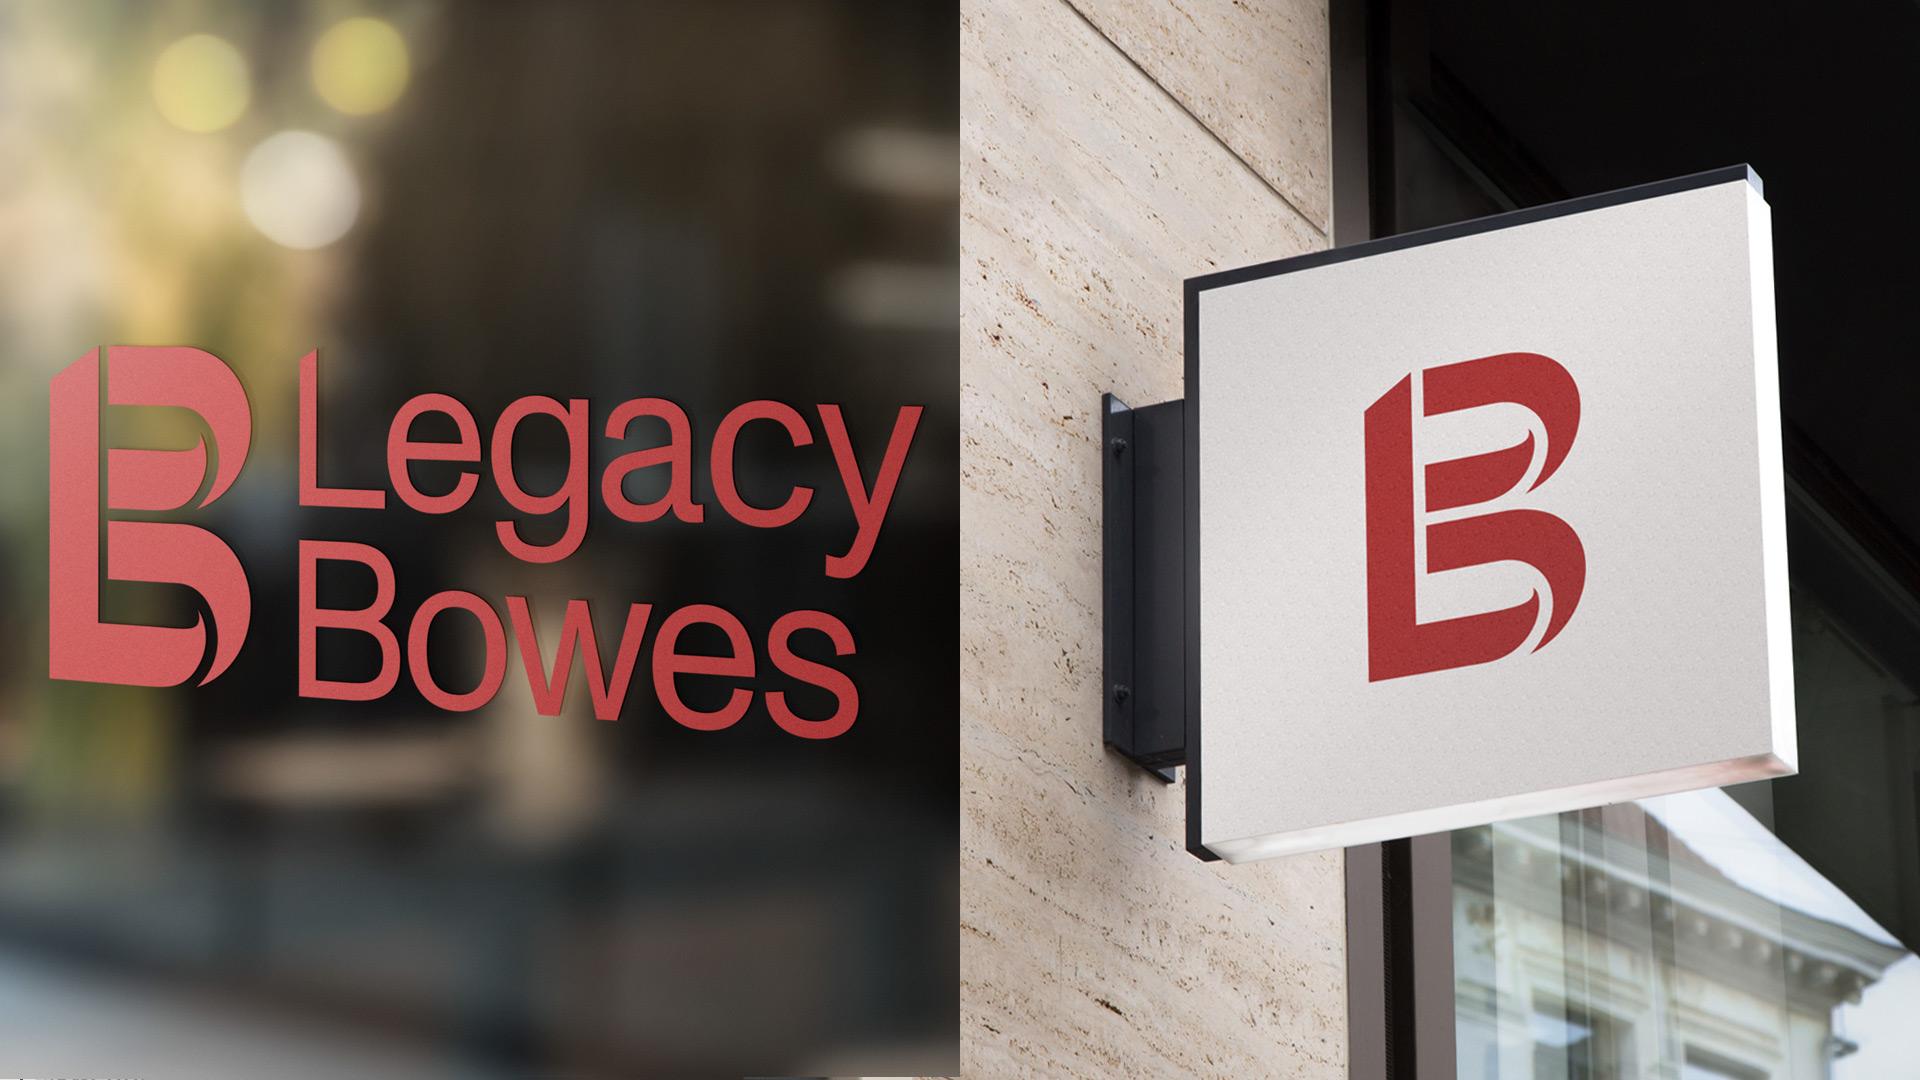 Legacy Bowes Logo display